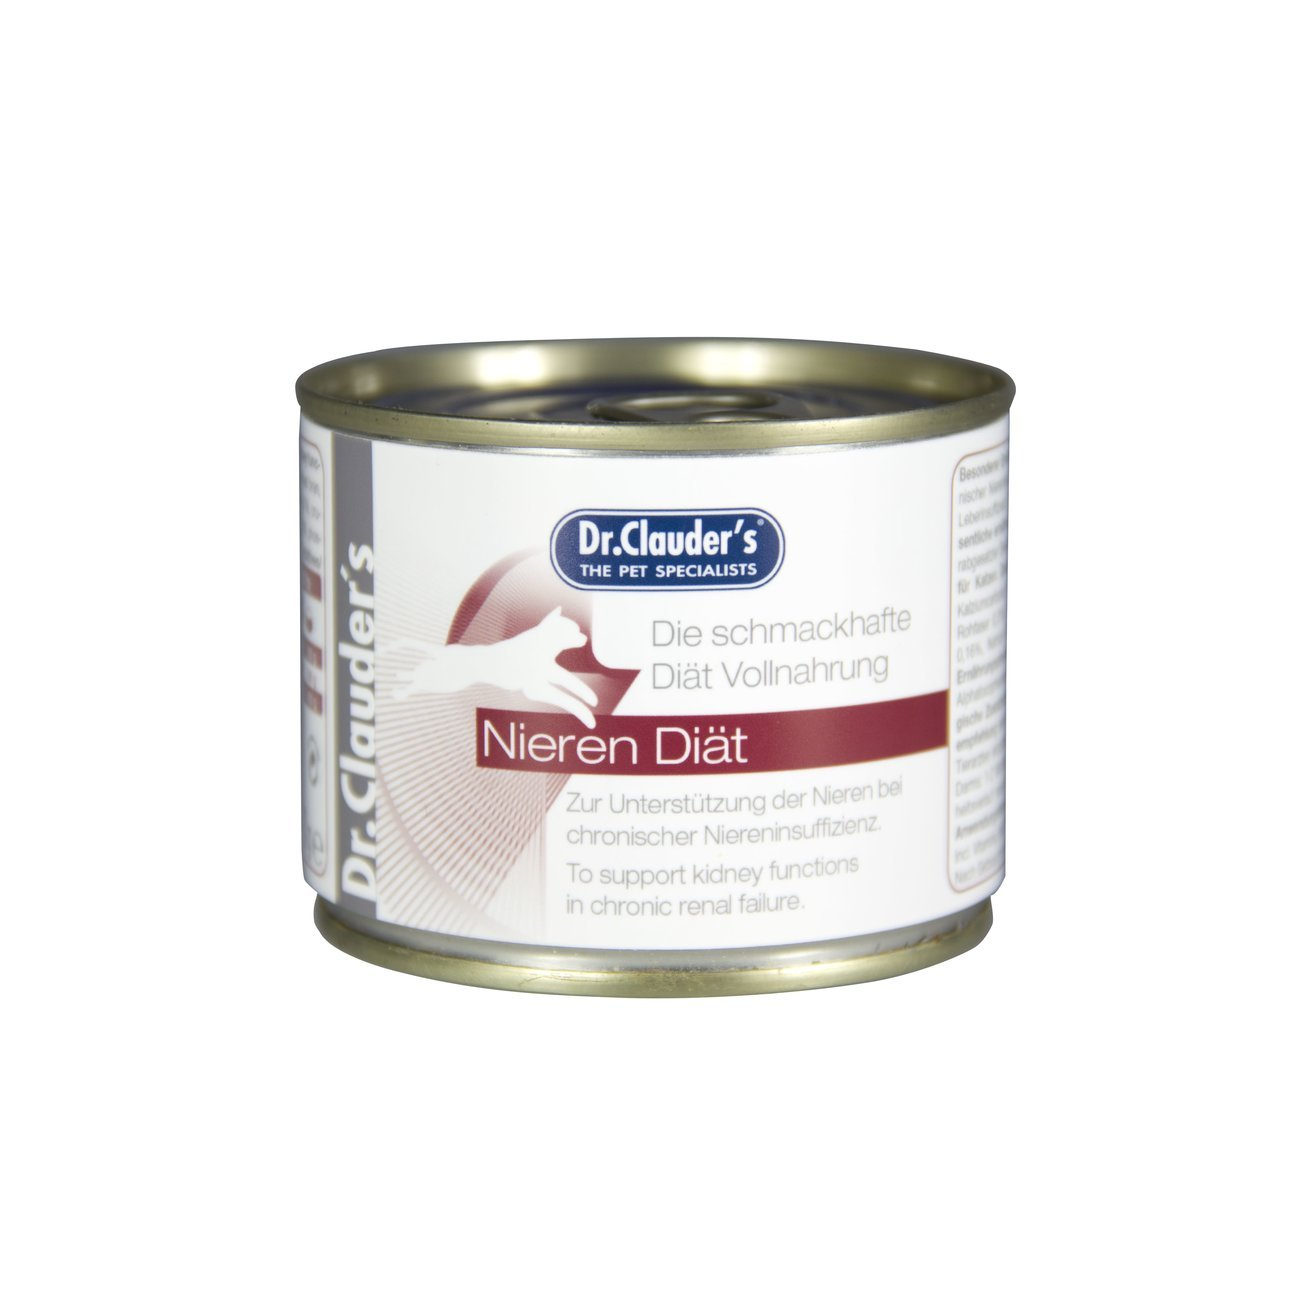 Dr. Clauders High Premium Diät Katzenfutter Dose, Bild 4